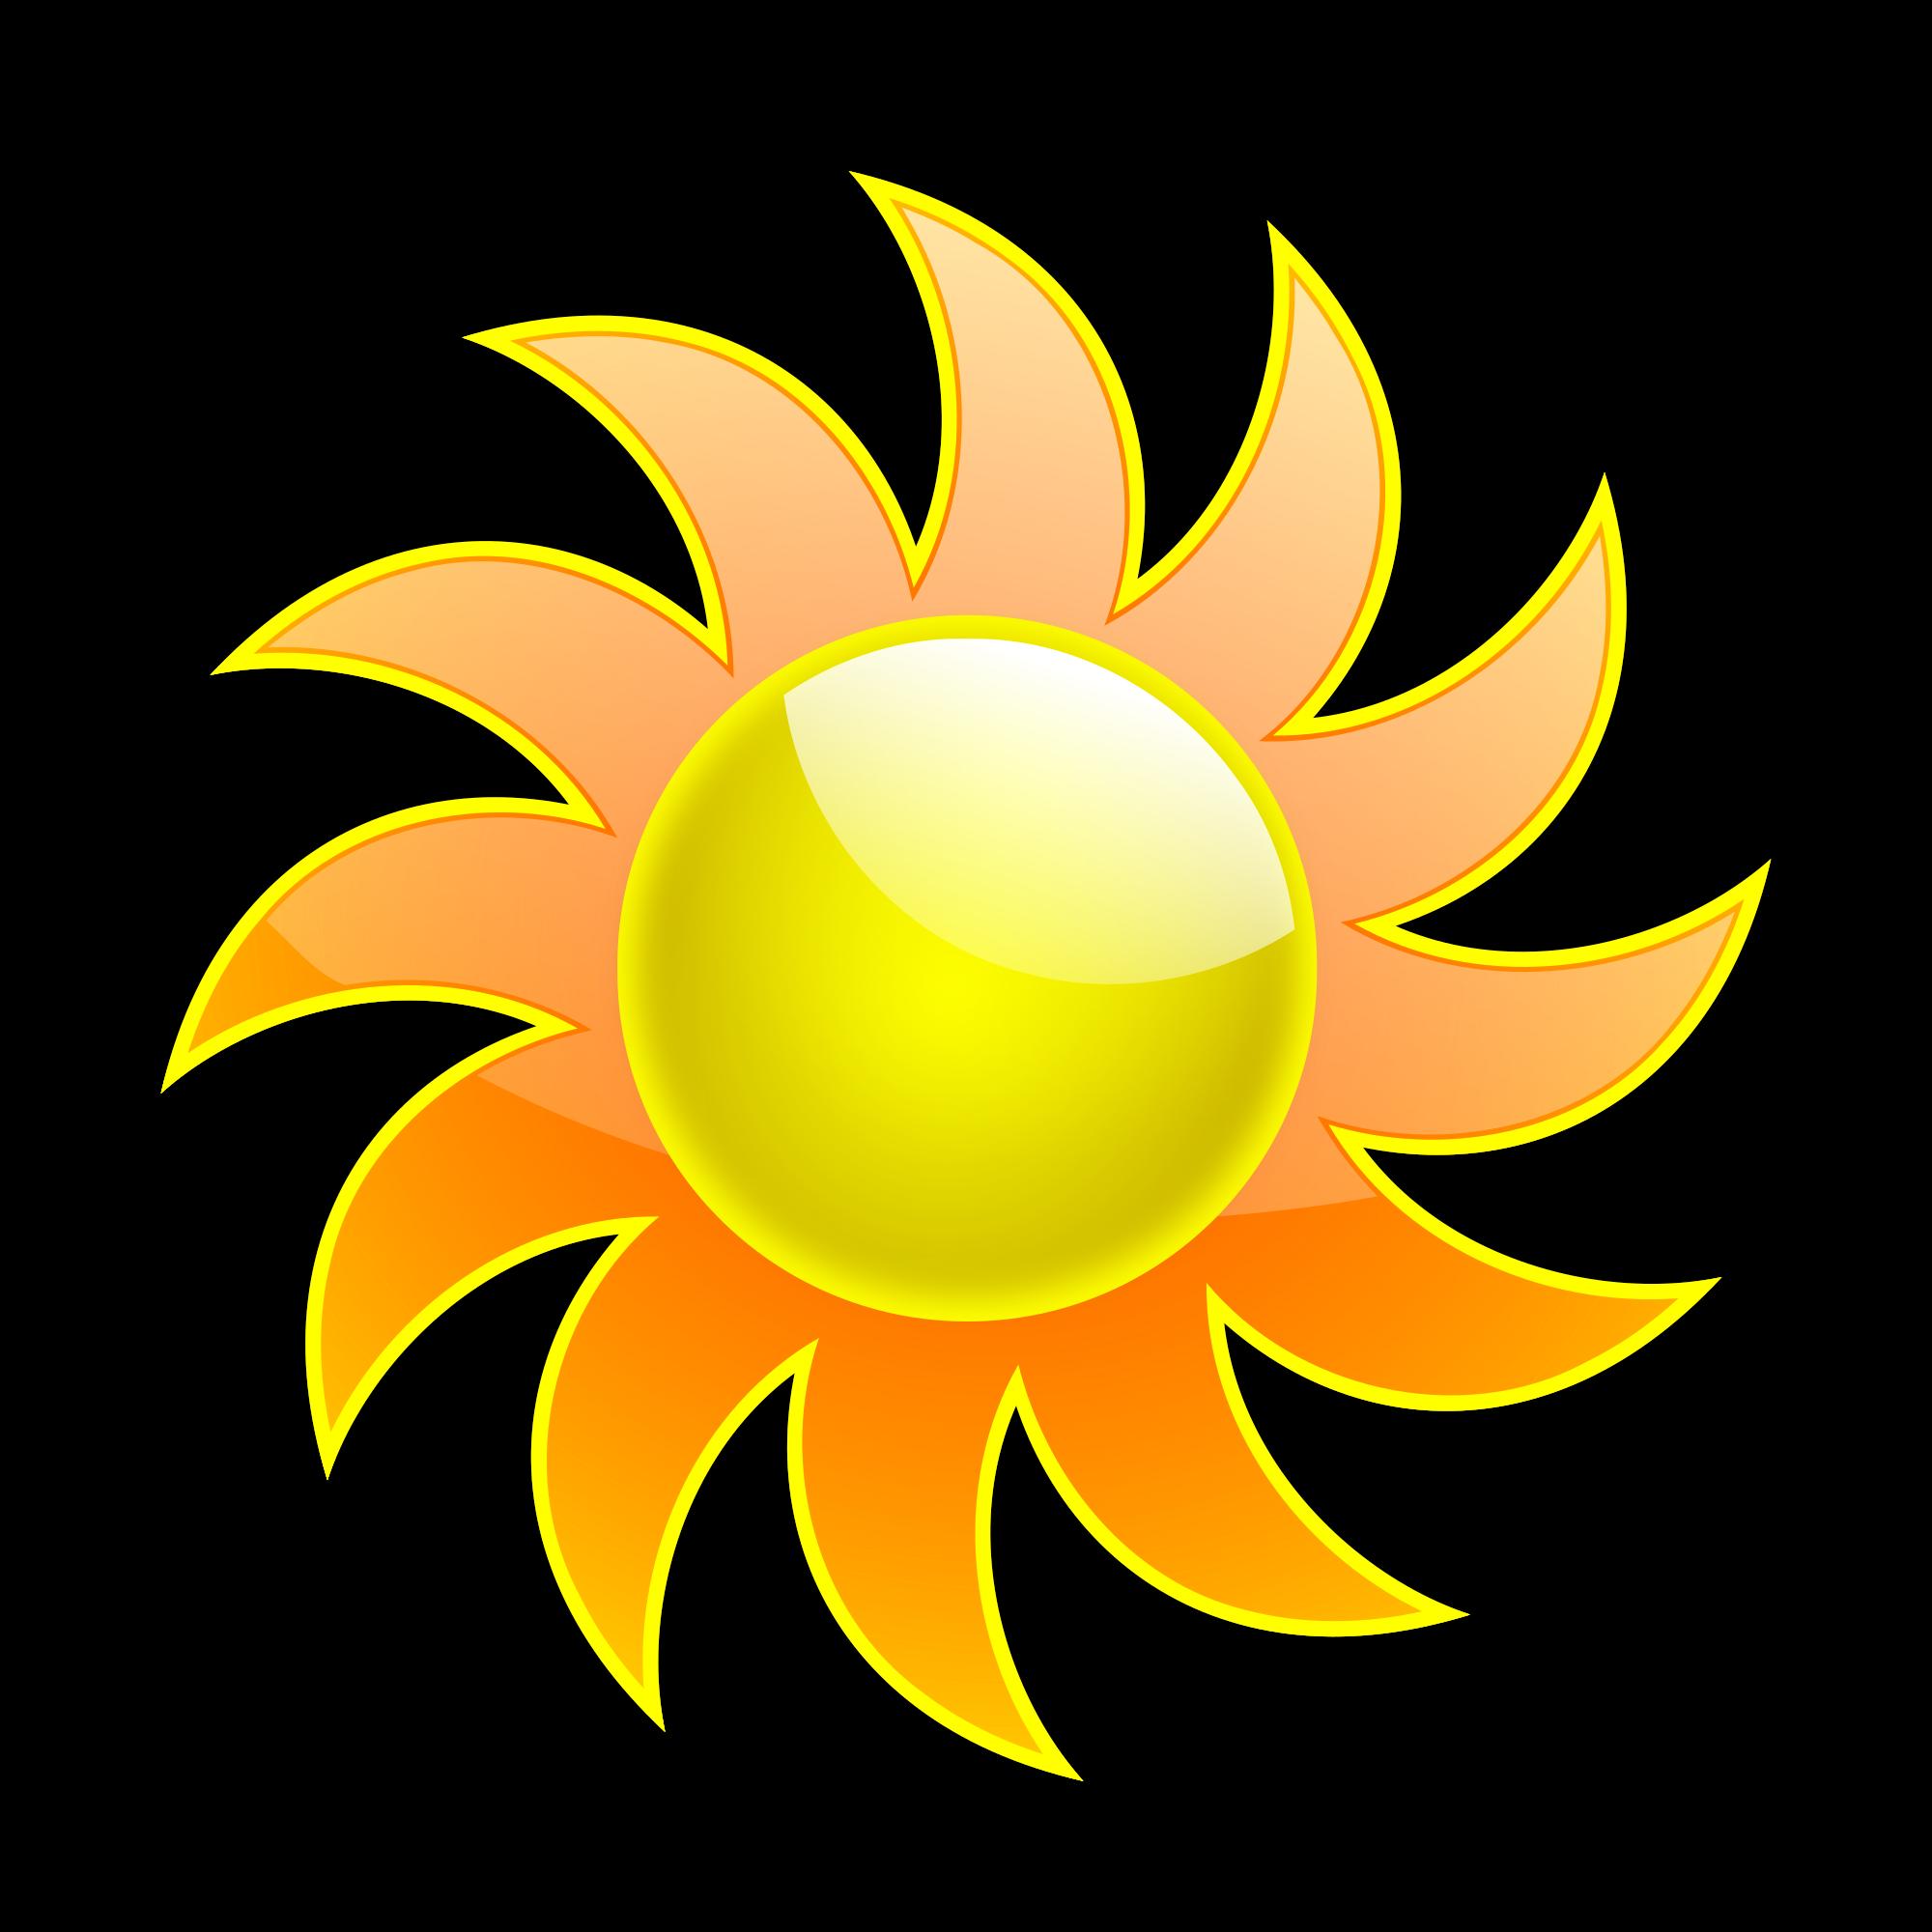 2000x2000 Cool Sun Clip Art Free Clipart Images Image 2